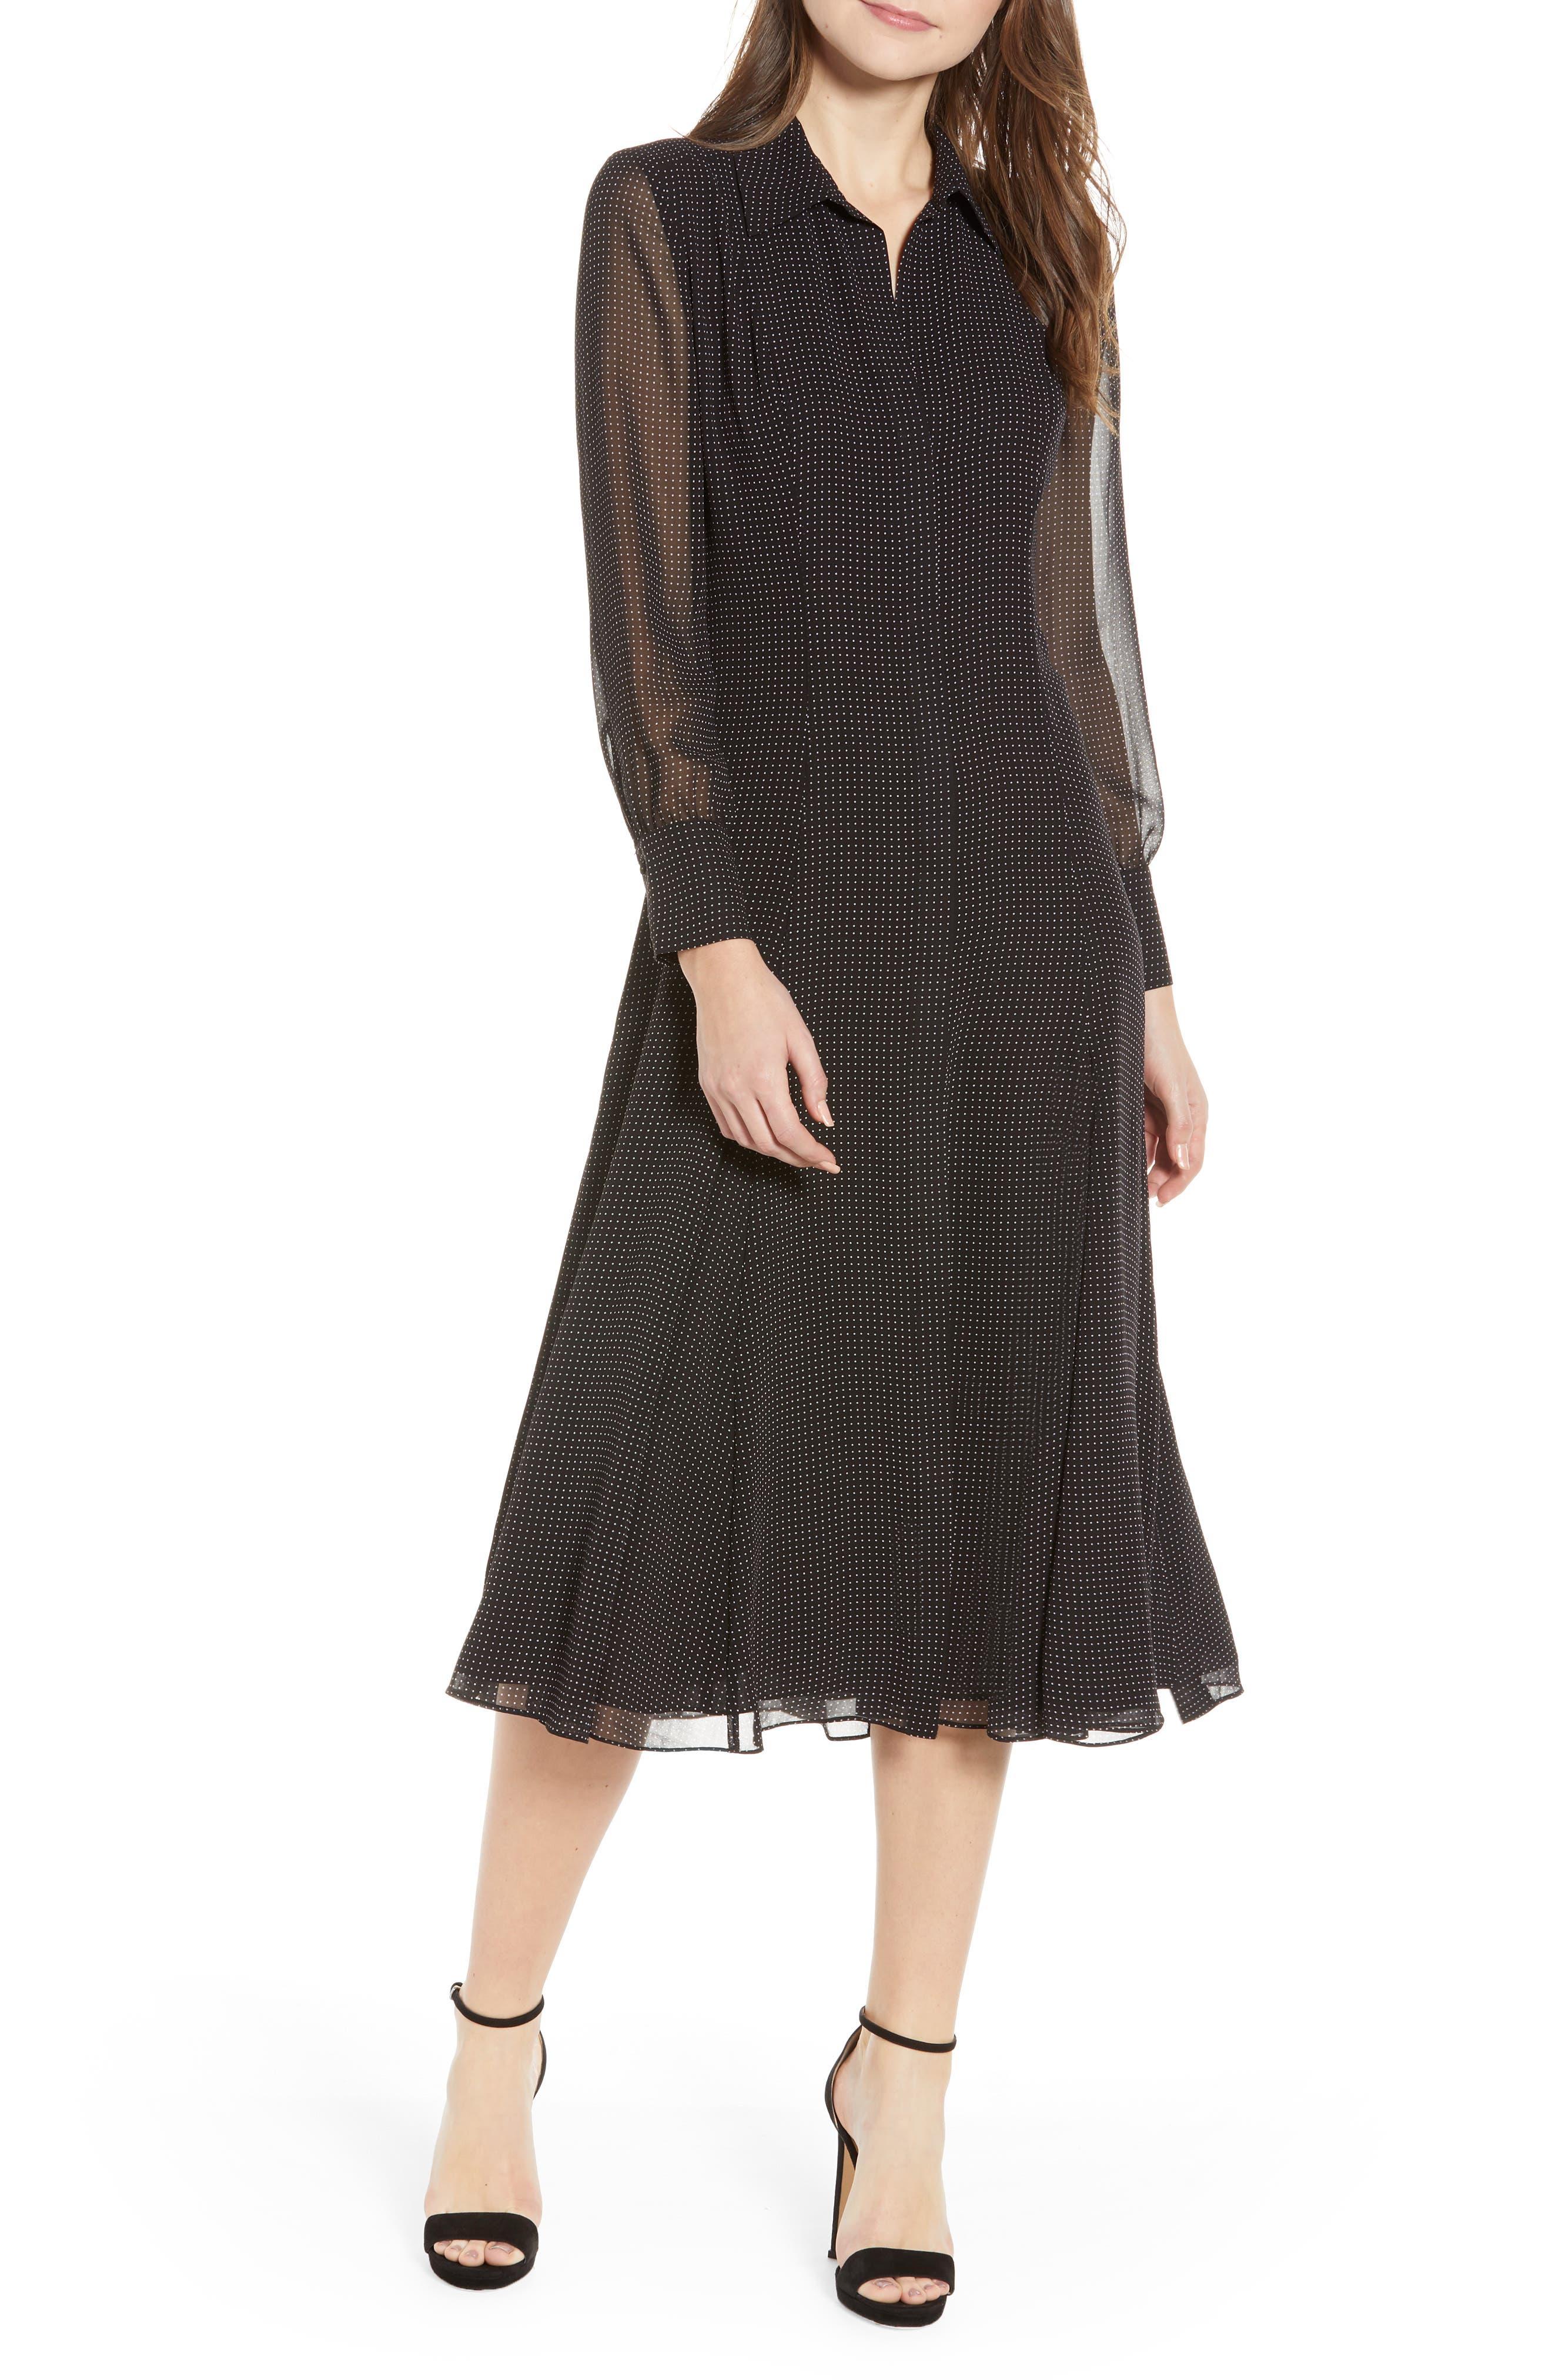 REBECCA MINKOFF,                             Kimberly Dot Sheer Sleeve Dress,                             Main thumbnail 1, color,                             BLACK/ WHITE